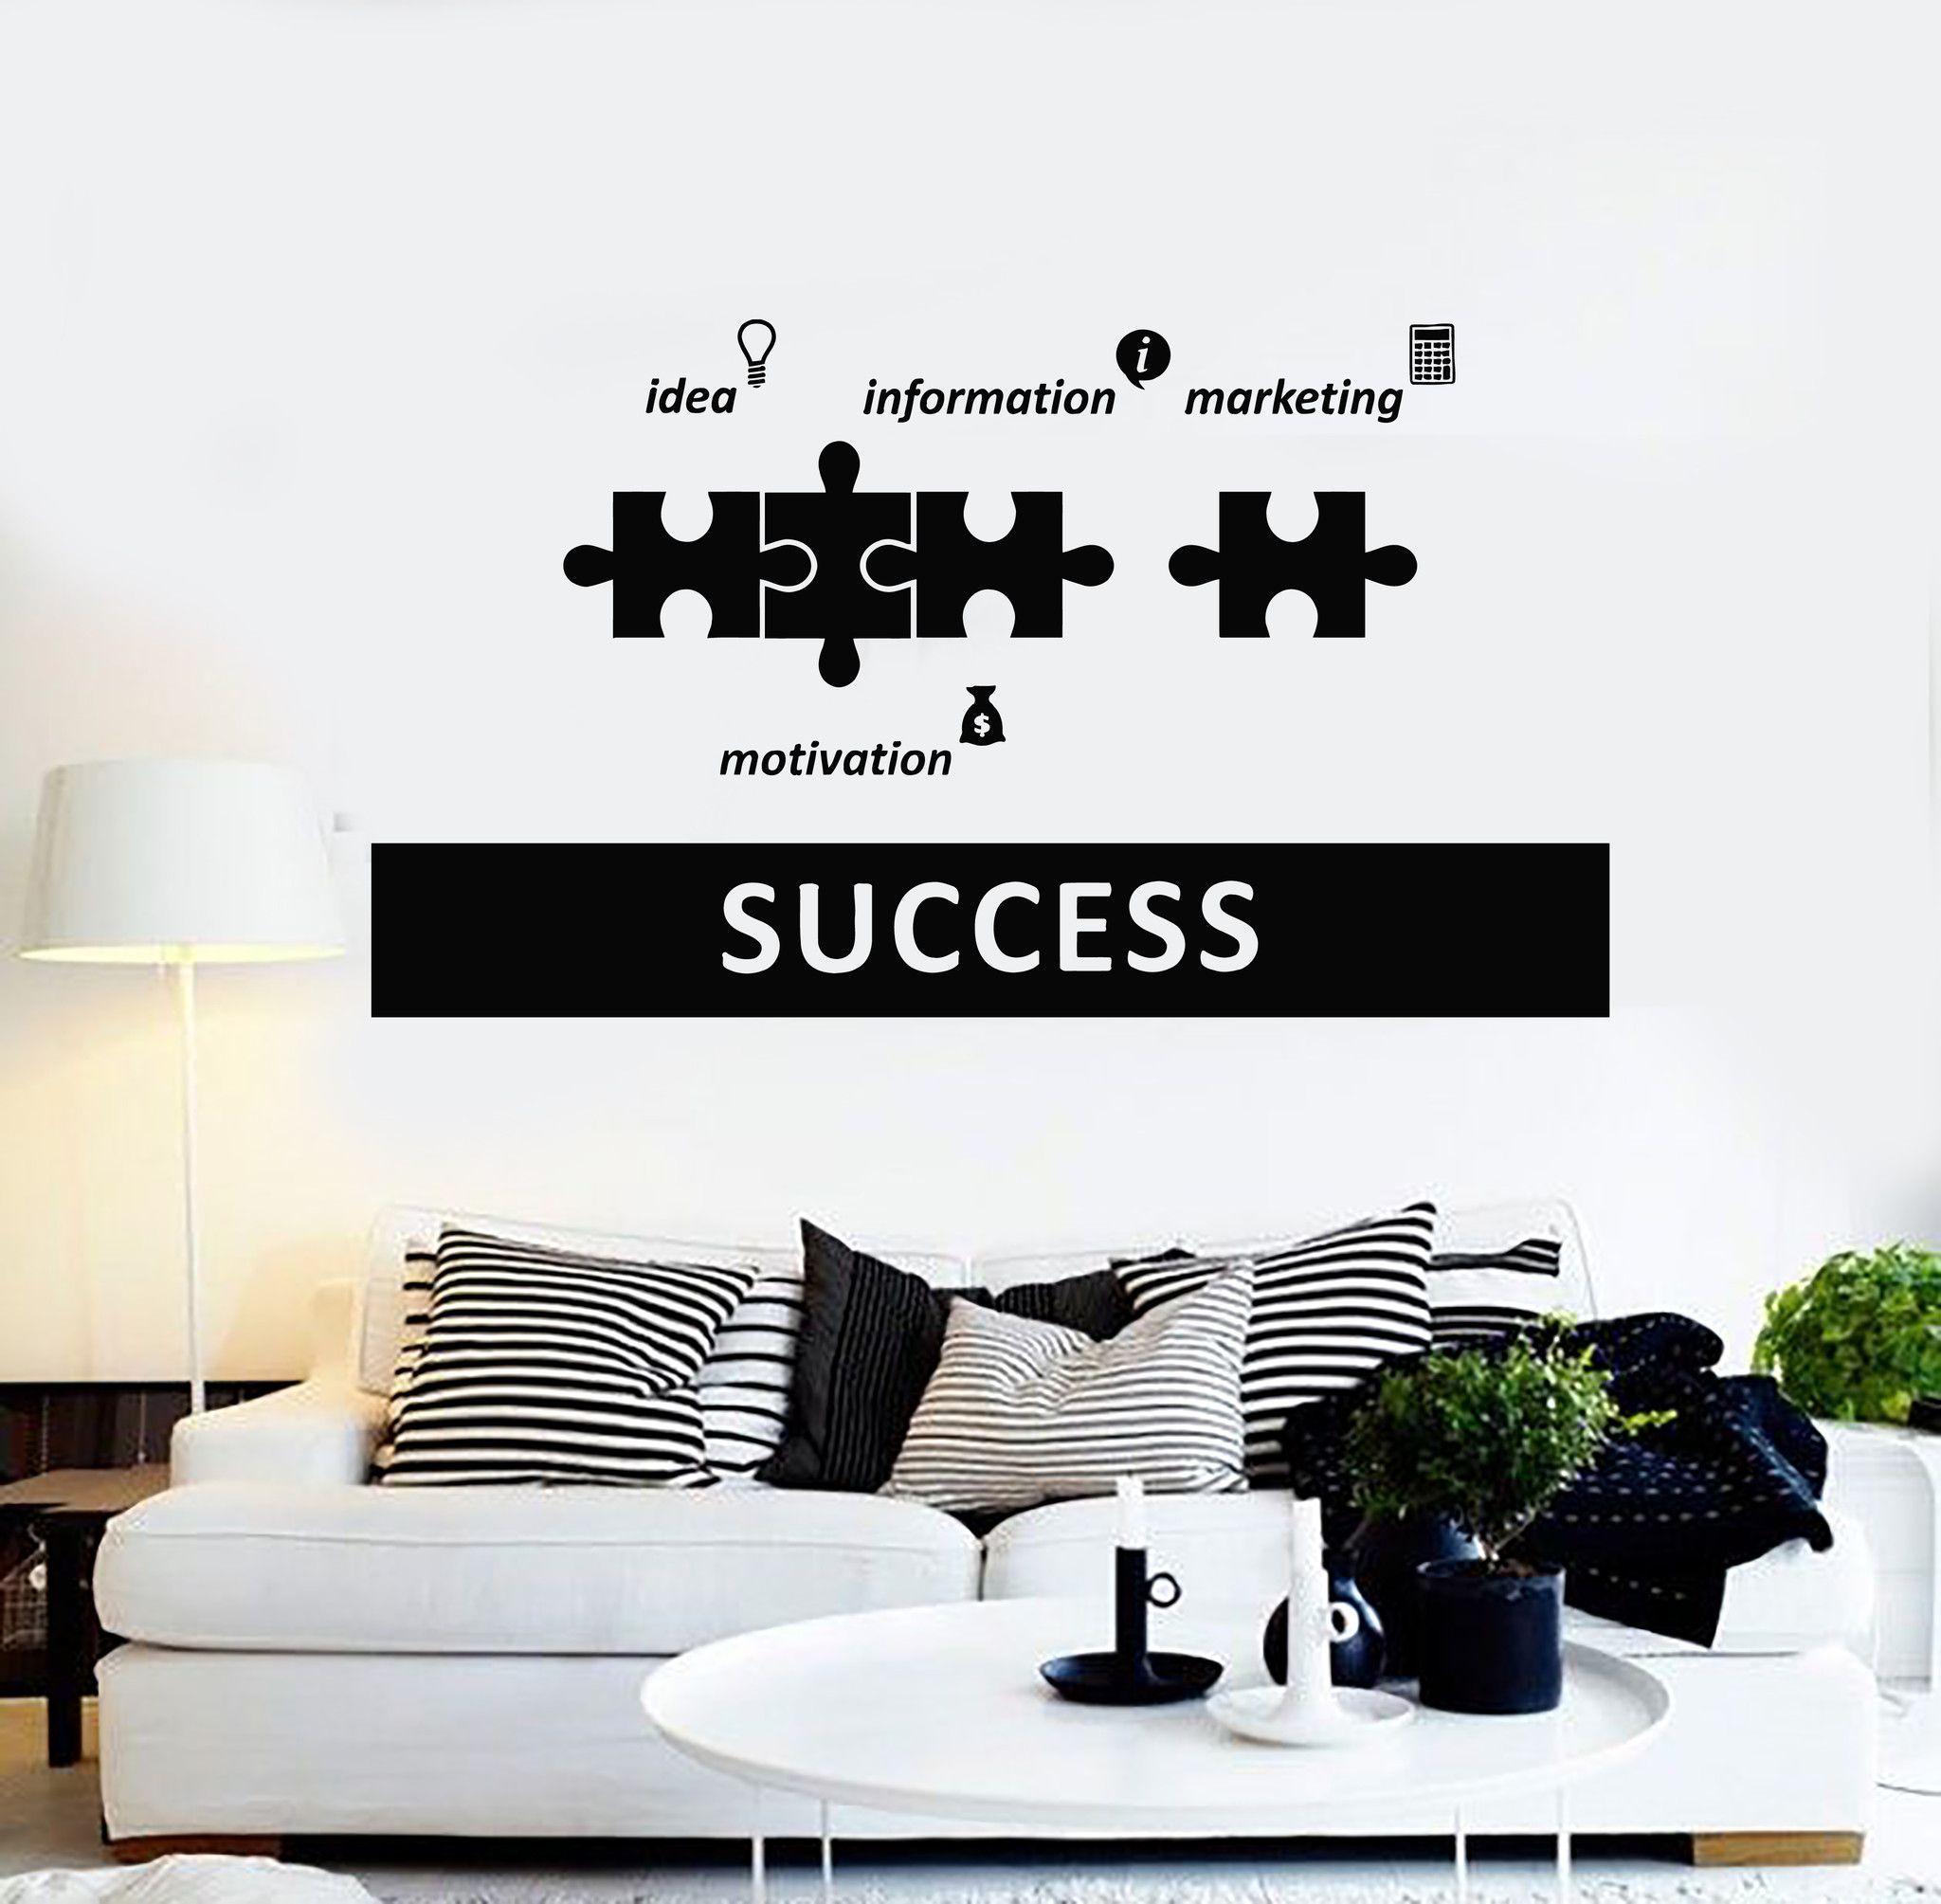 9e2c22e8b93 Vinyl Wall Decal Success Office Decoration Motivation Stickers (ig4385)